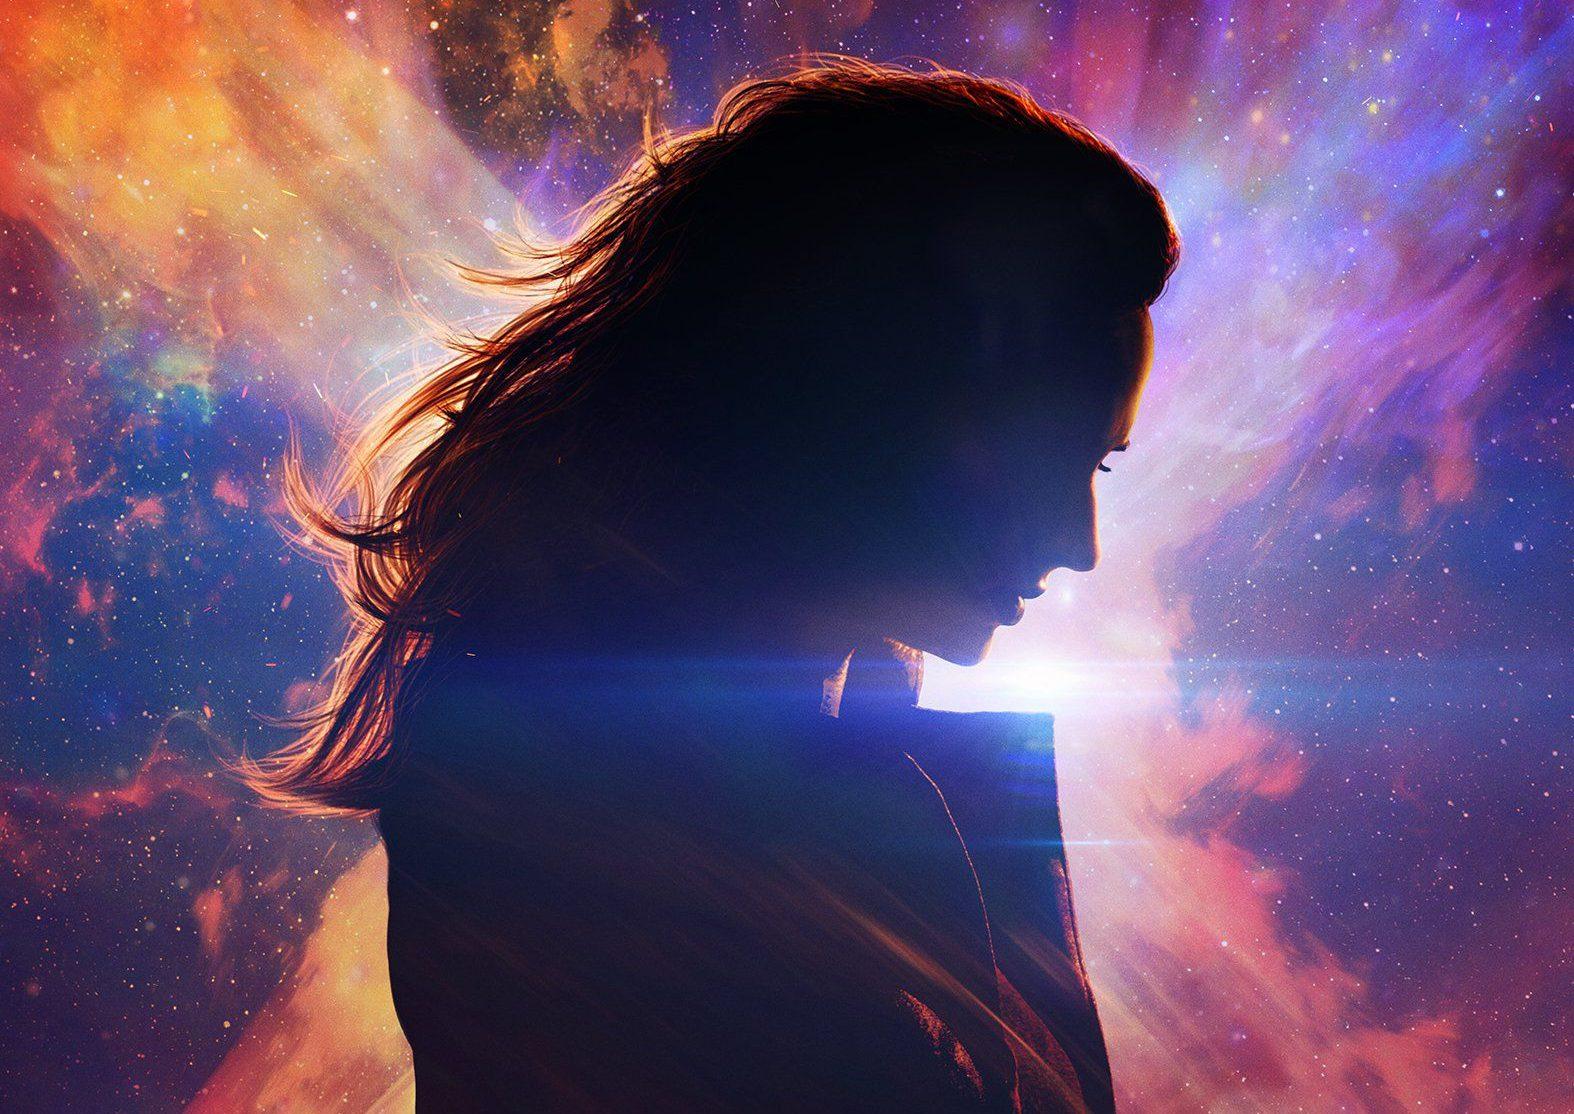 X Men: Dark Phoenix release date, cast and controversies as trailer arrives